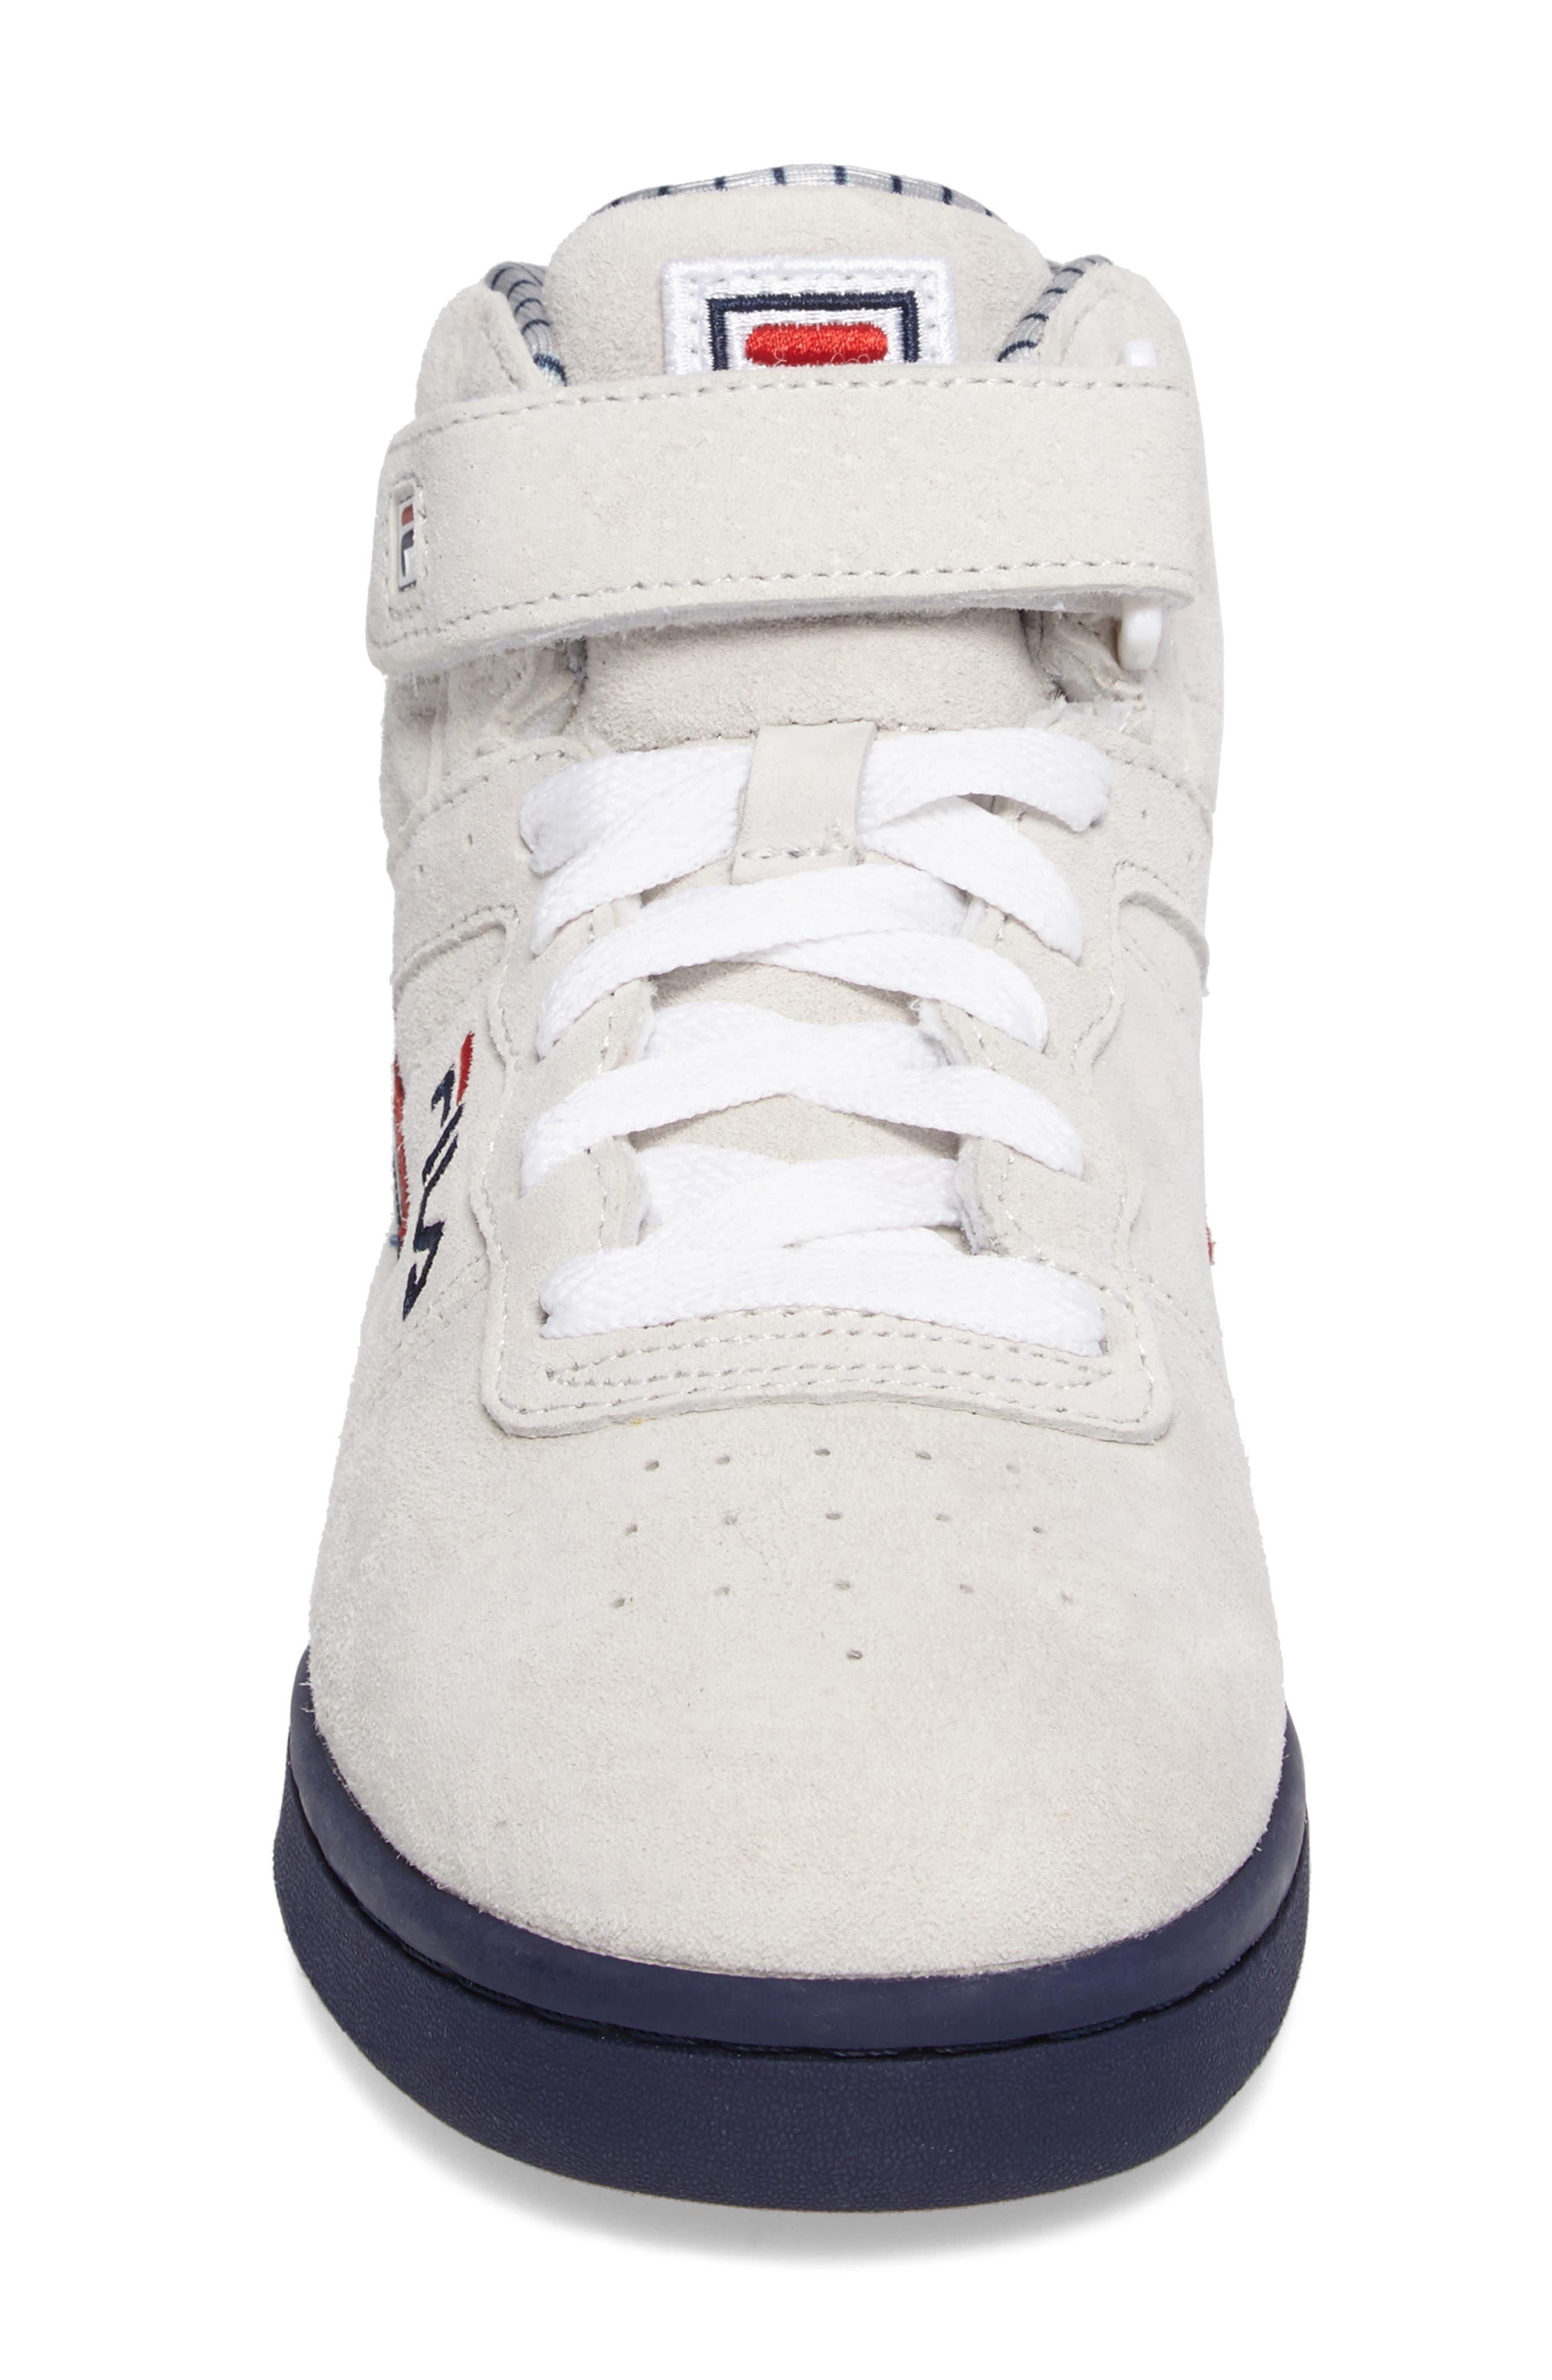 FILA, F-13 Mid Pinstripe Sneaker, Alternate thumbnail 4, color, 150